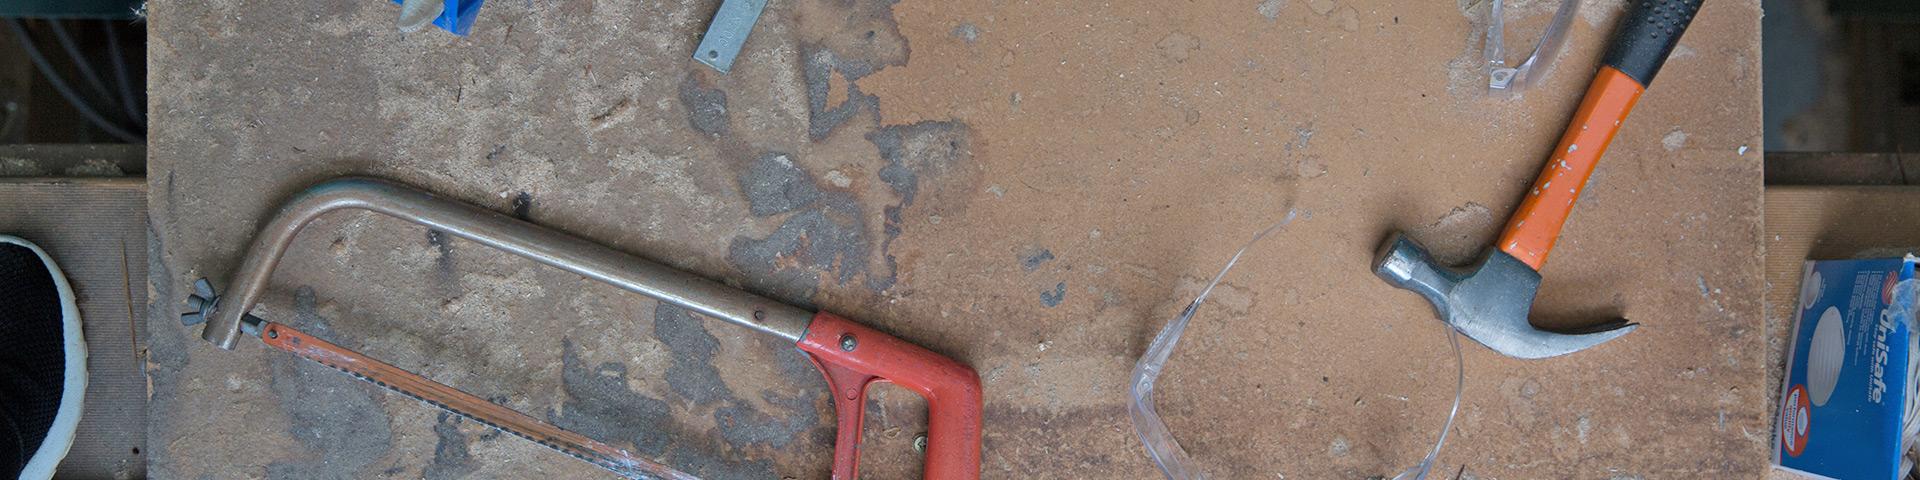 Remarkable Work Bench Home Timber Hardware Evergreenethics Interior Chair Design Evergreenethicsorg